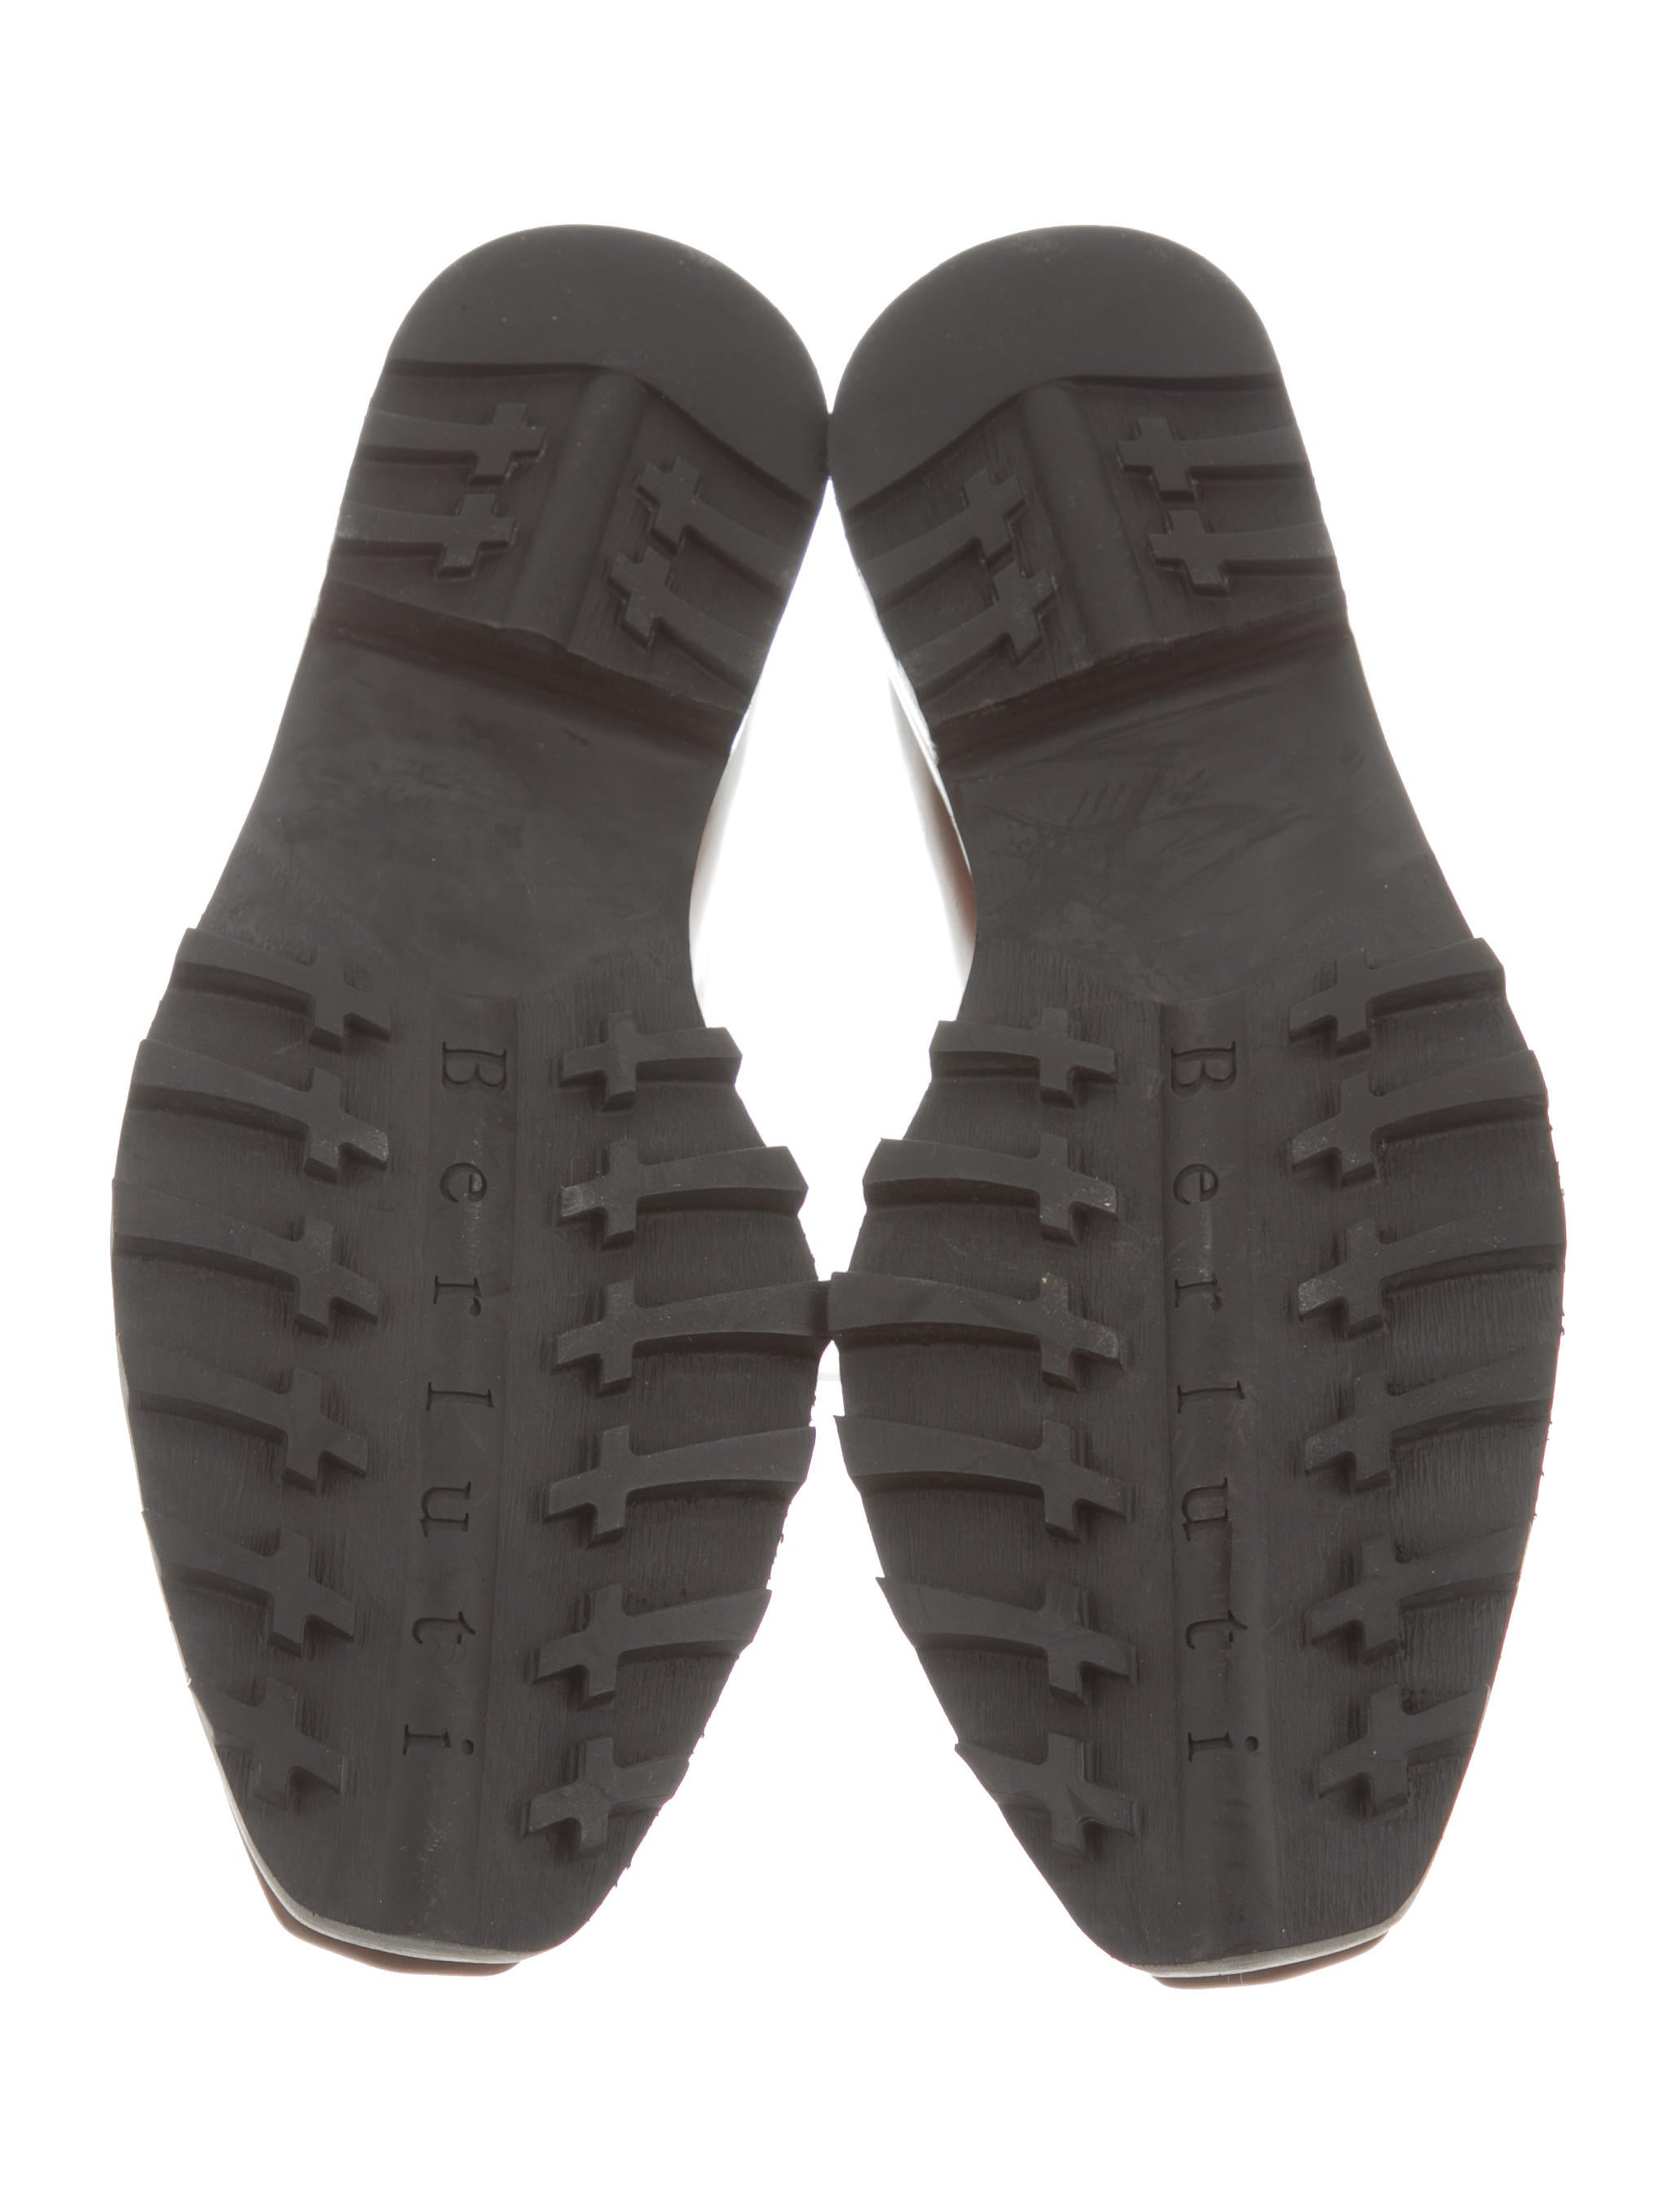 Black sandals ultima online - New Ultima Derby Shoes